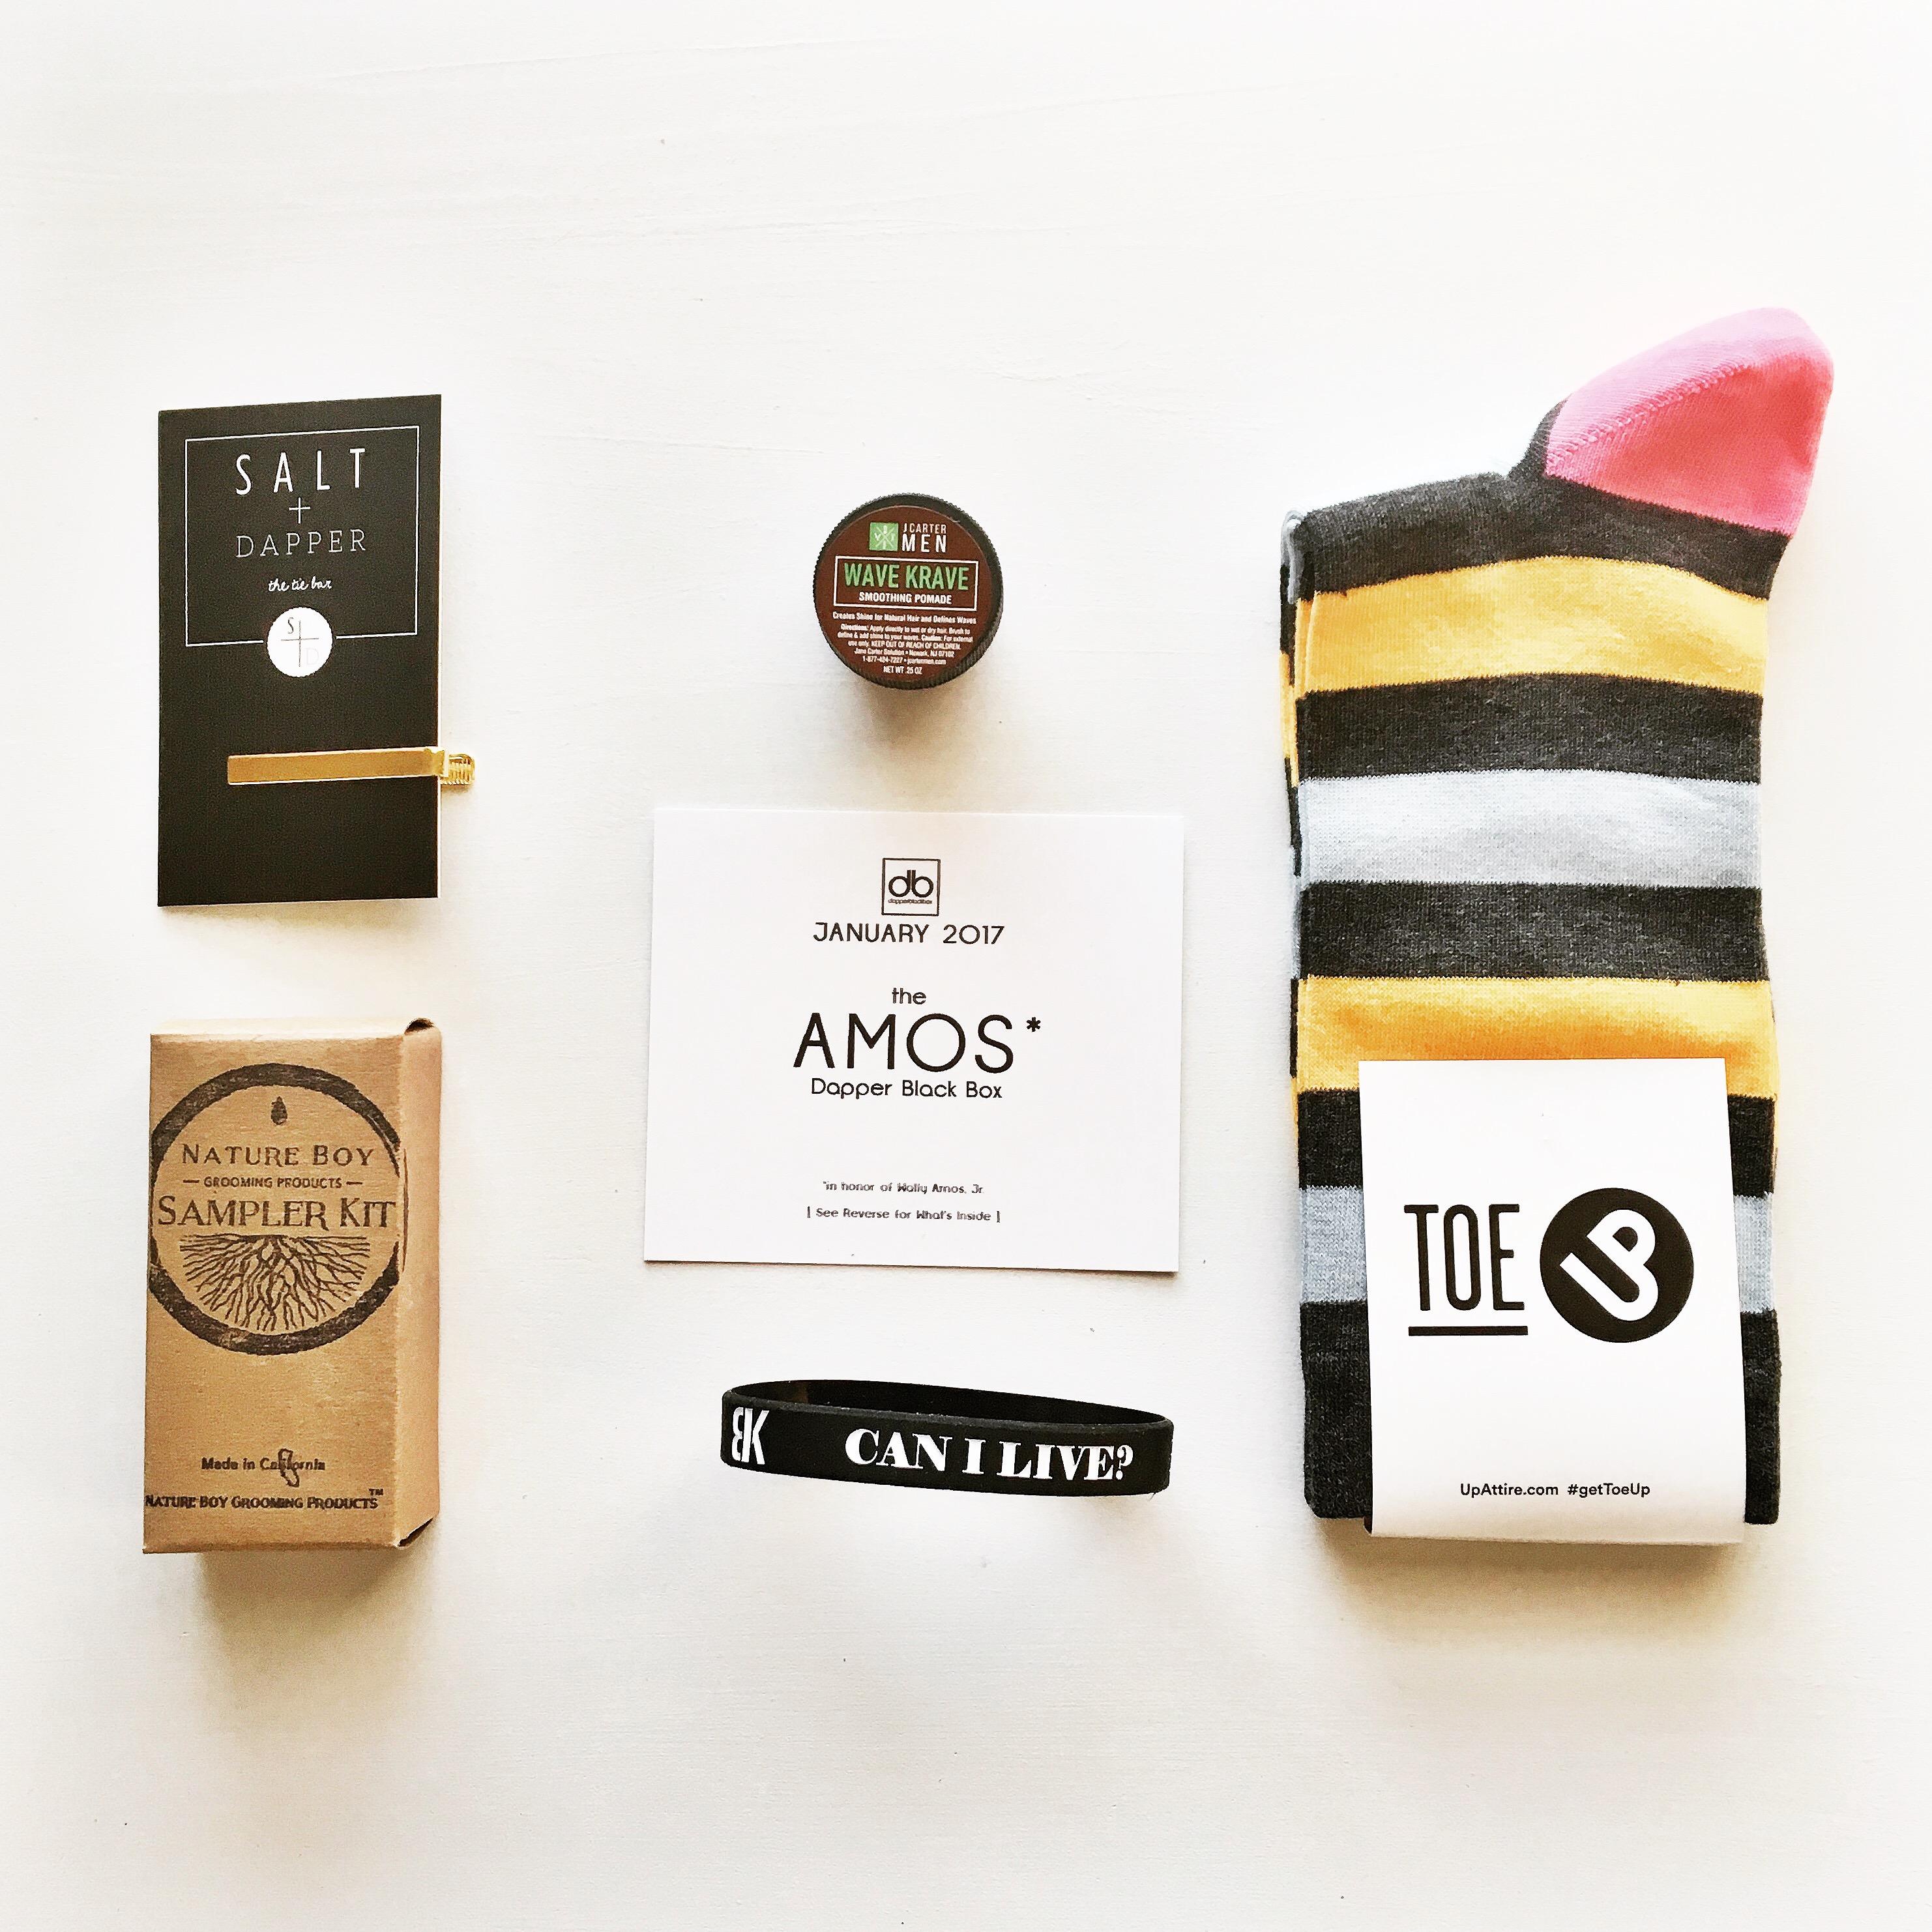 The Amos Box